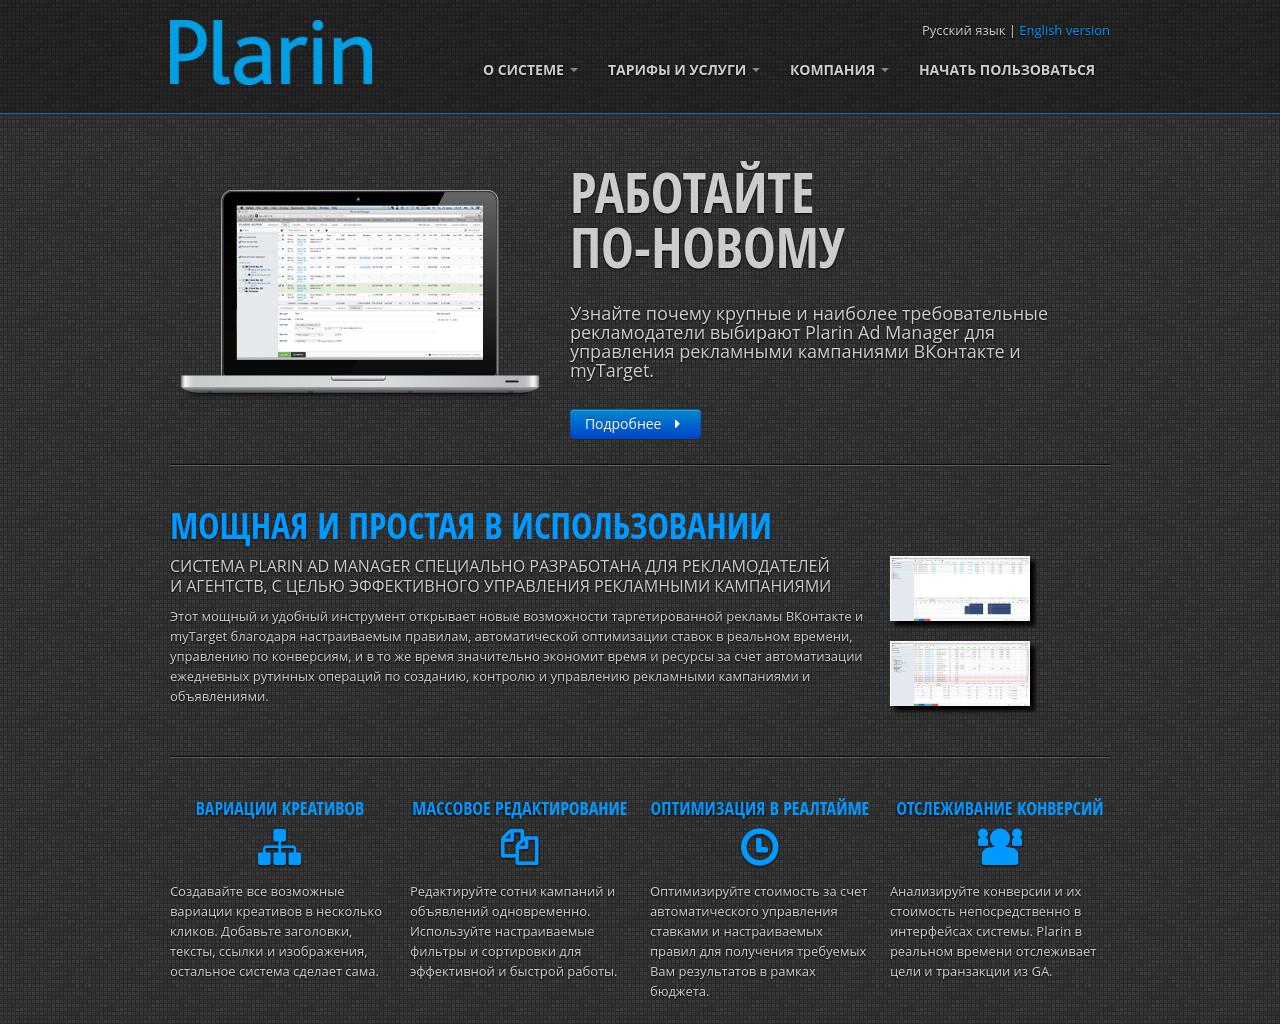 Plarin-Advertising-Reviews-Pricing